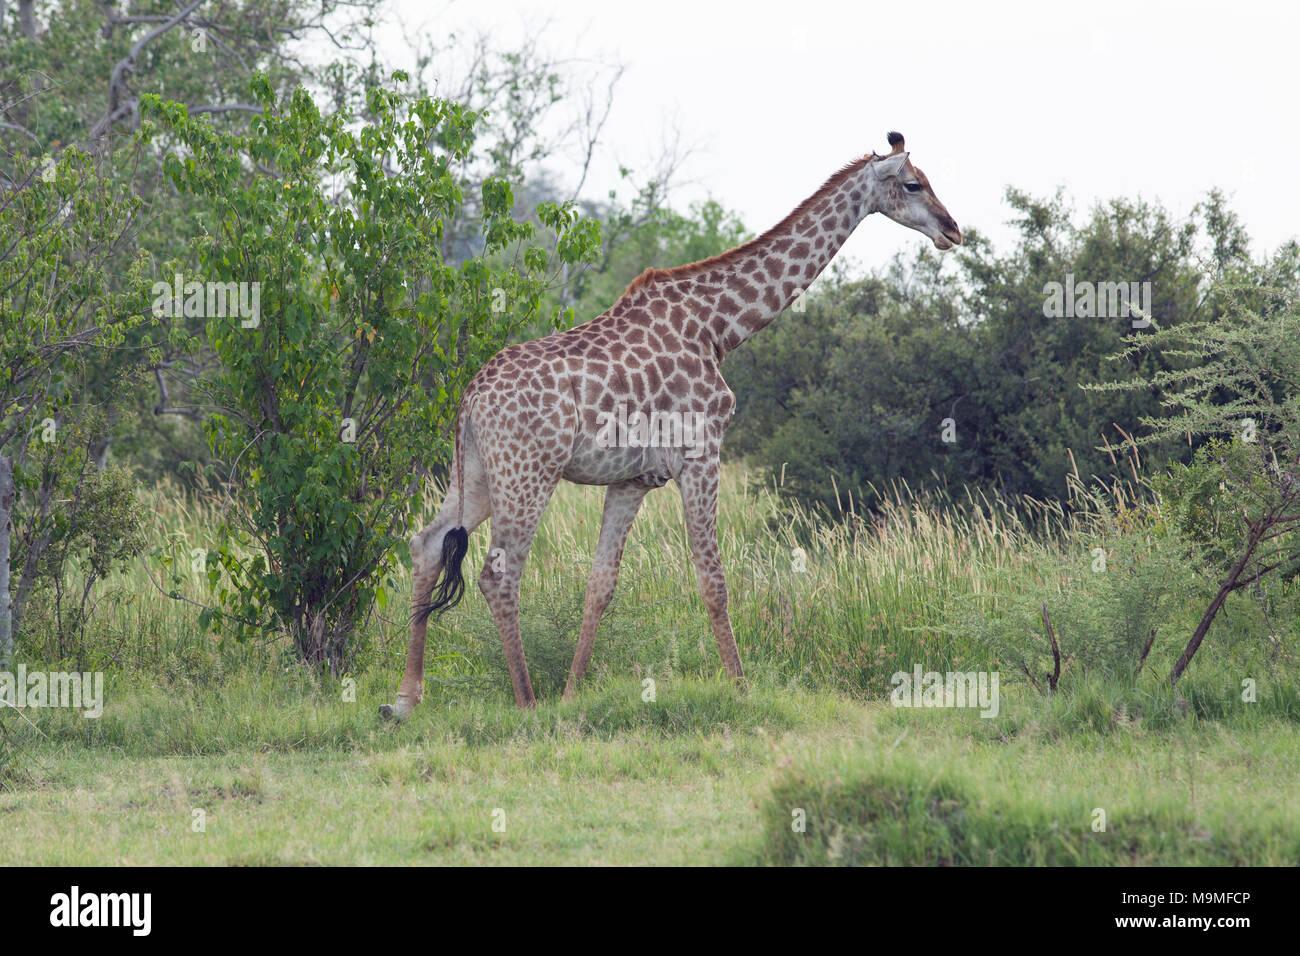 Jirafa (Giraffa camelopardalis angolensis). Nota La forma, la trama ...